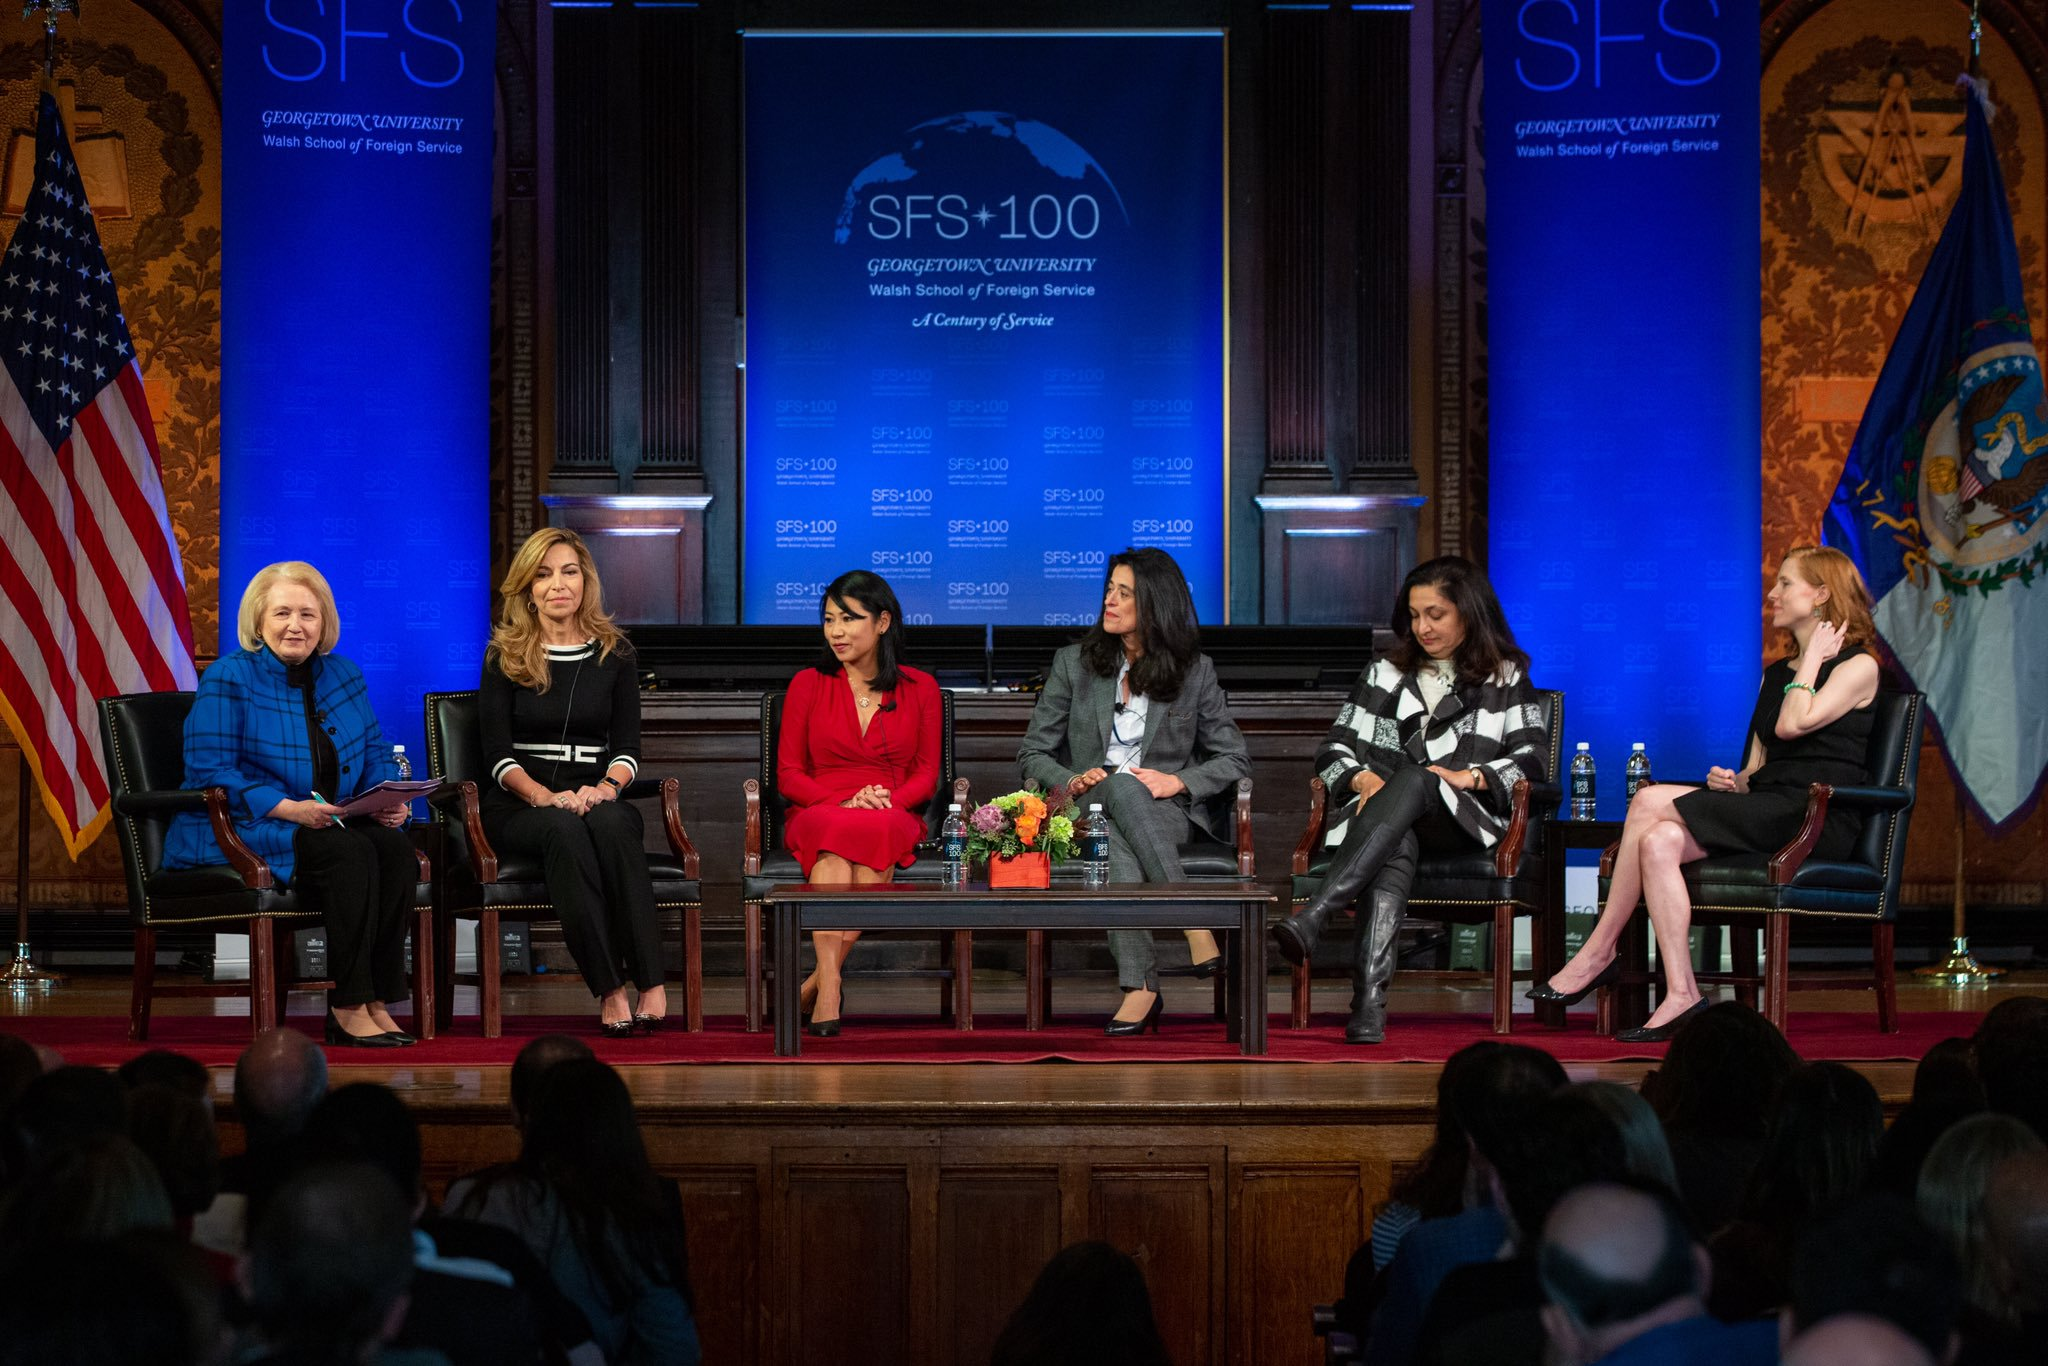 Melanne Verveer moderates panel in Gaston Hall about women's leadership